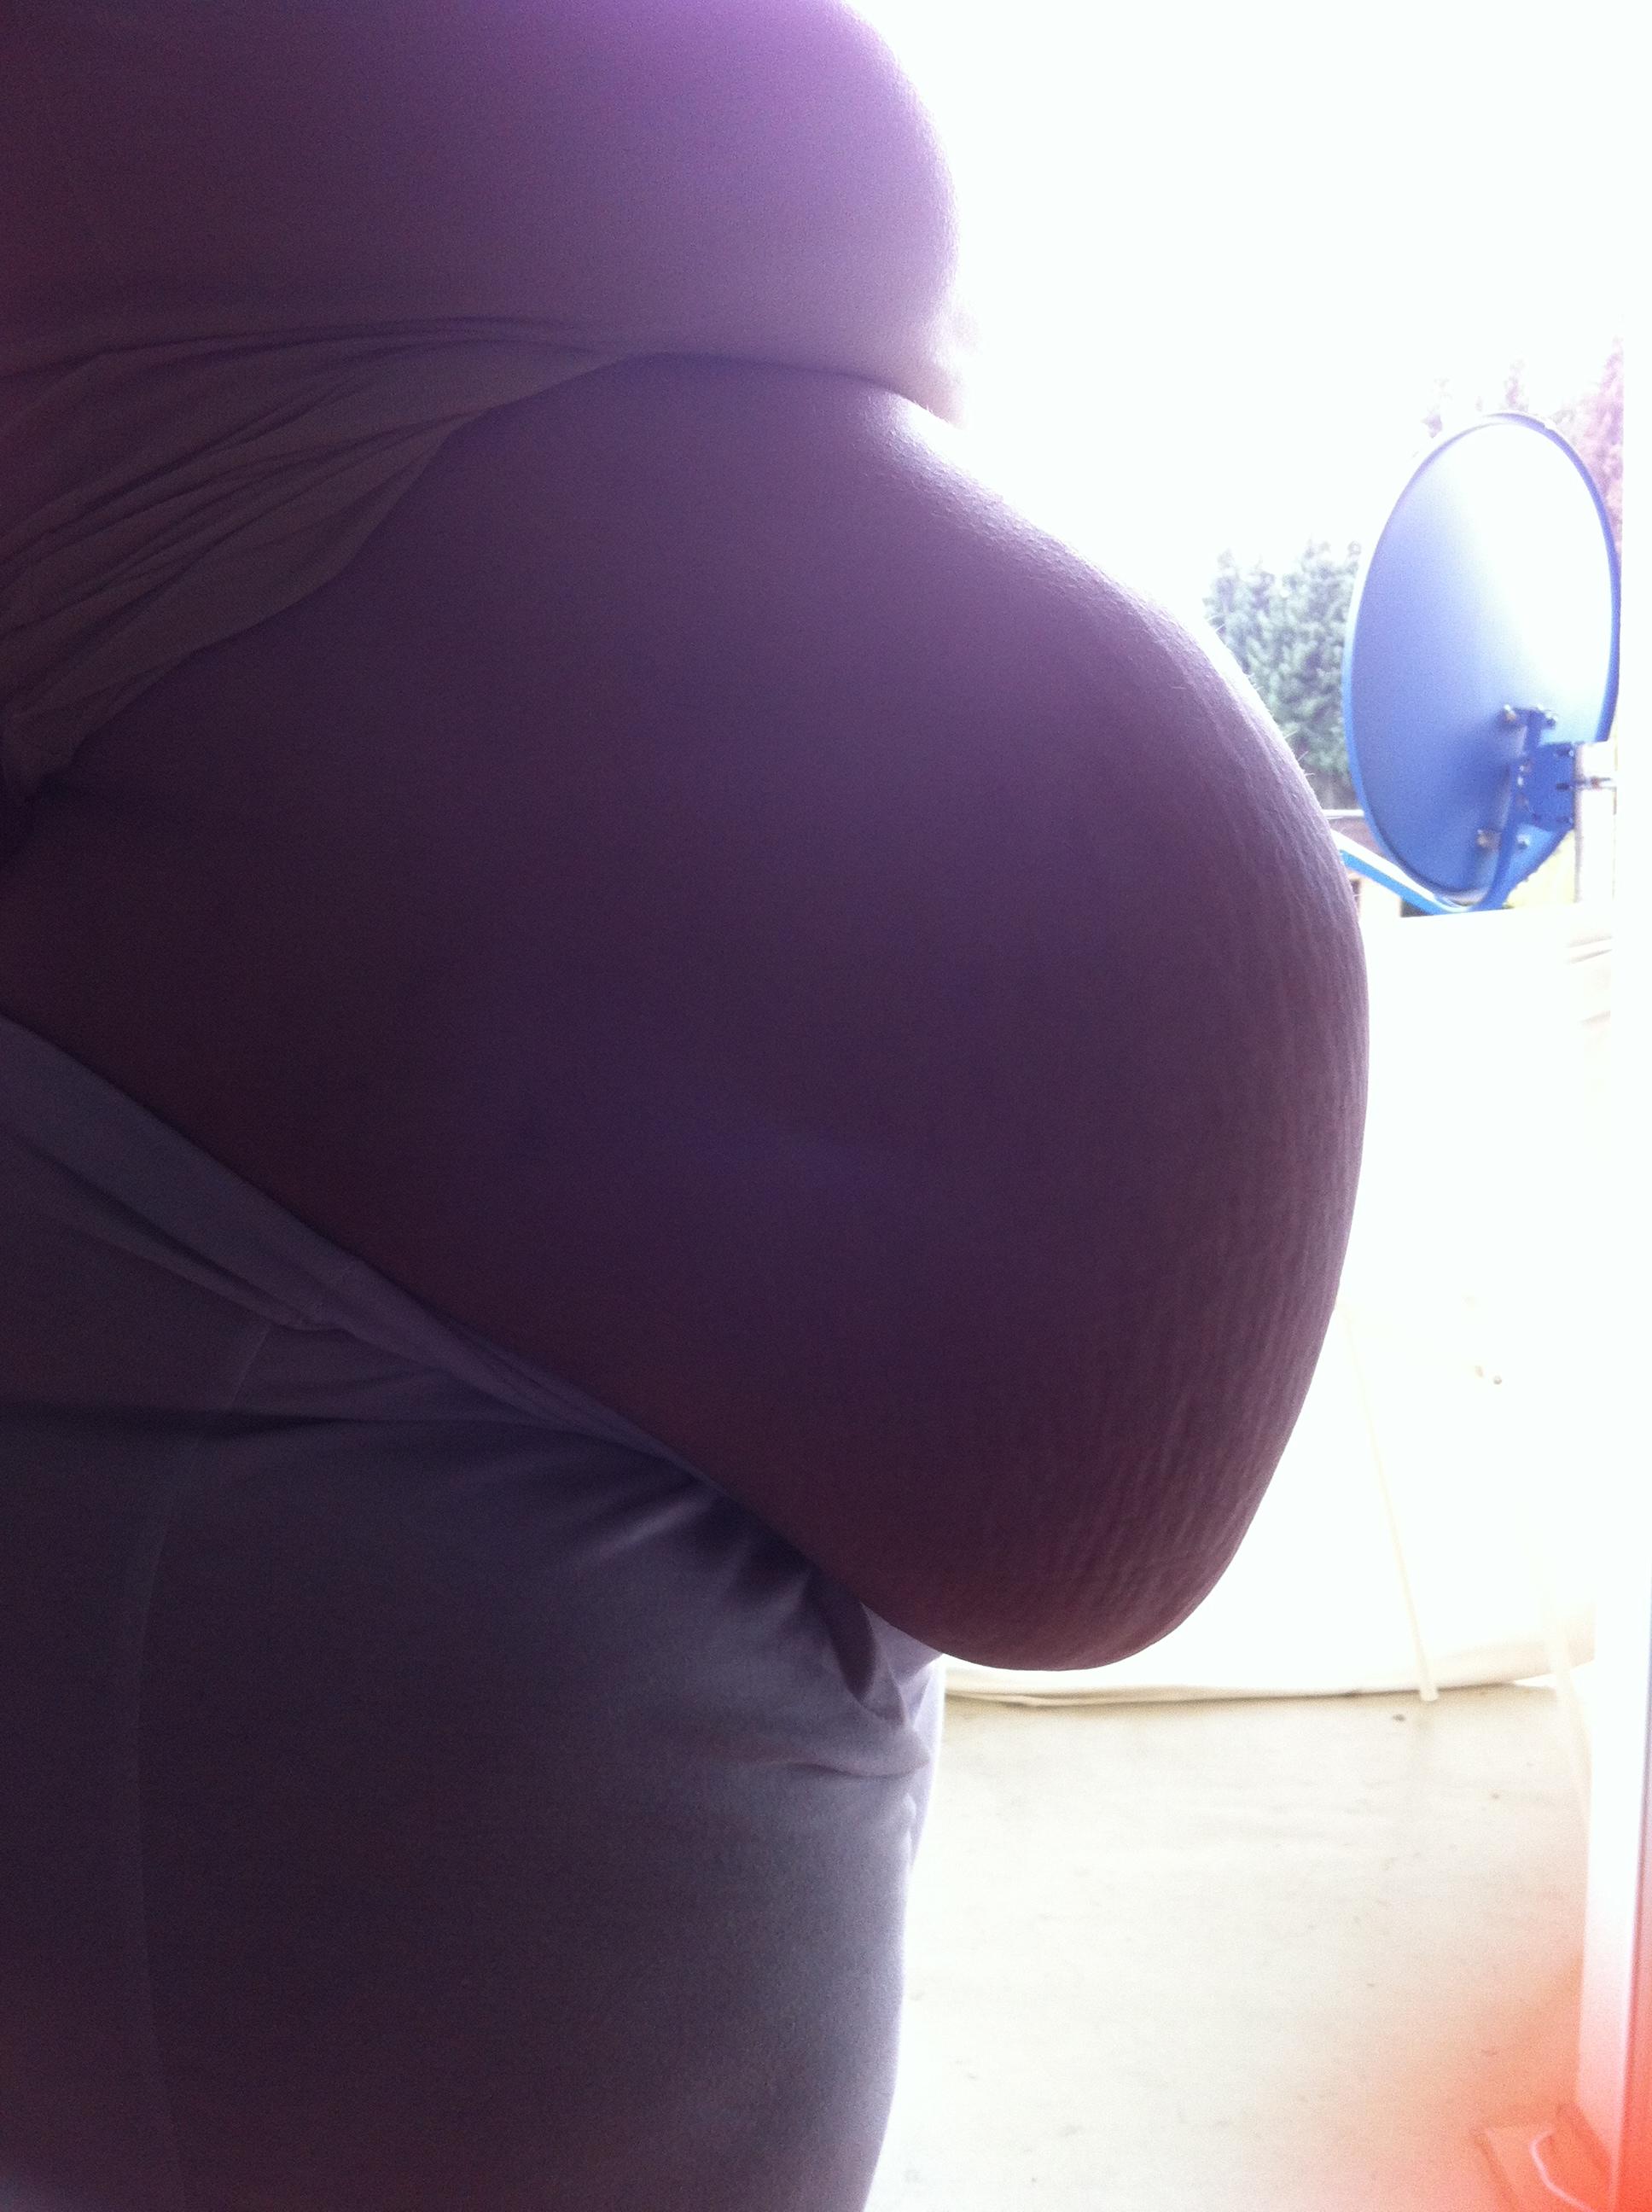 Hängebauch nach schwangerschaft